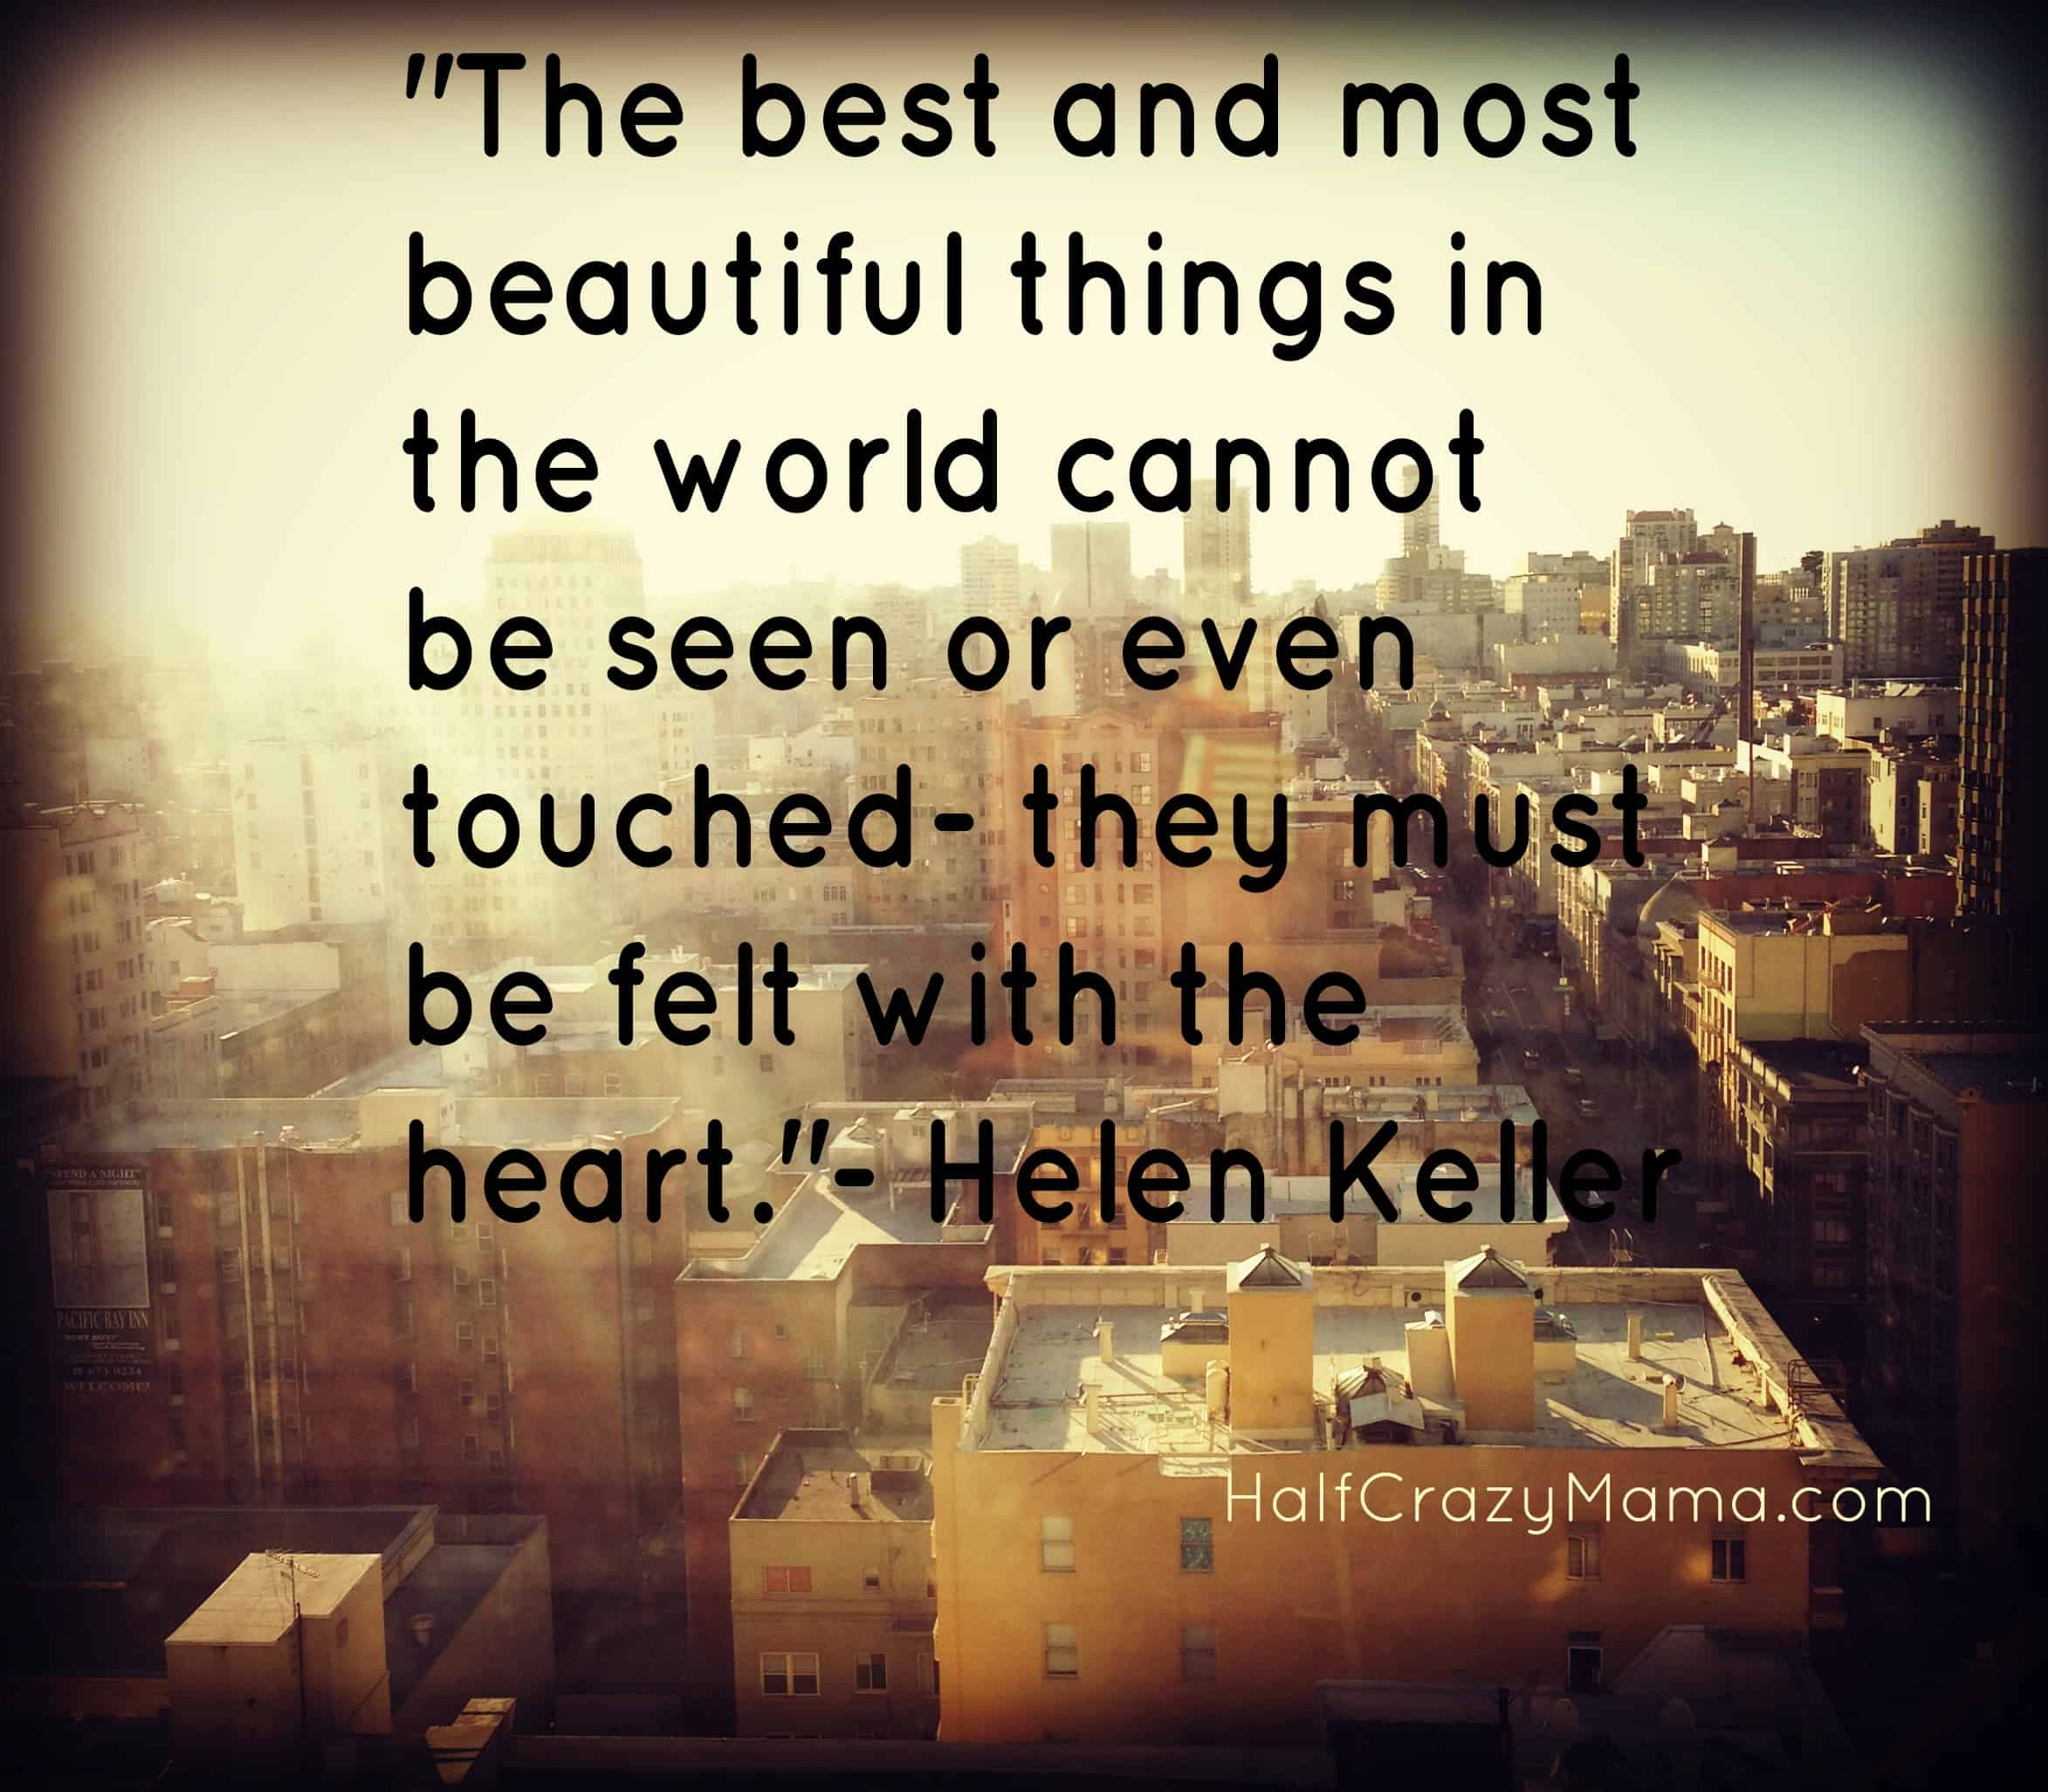 Helen Keller city scape